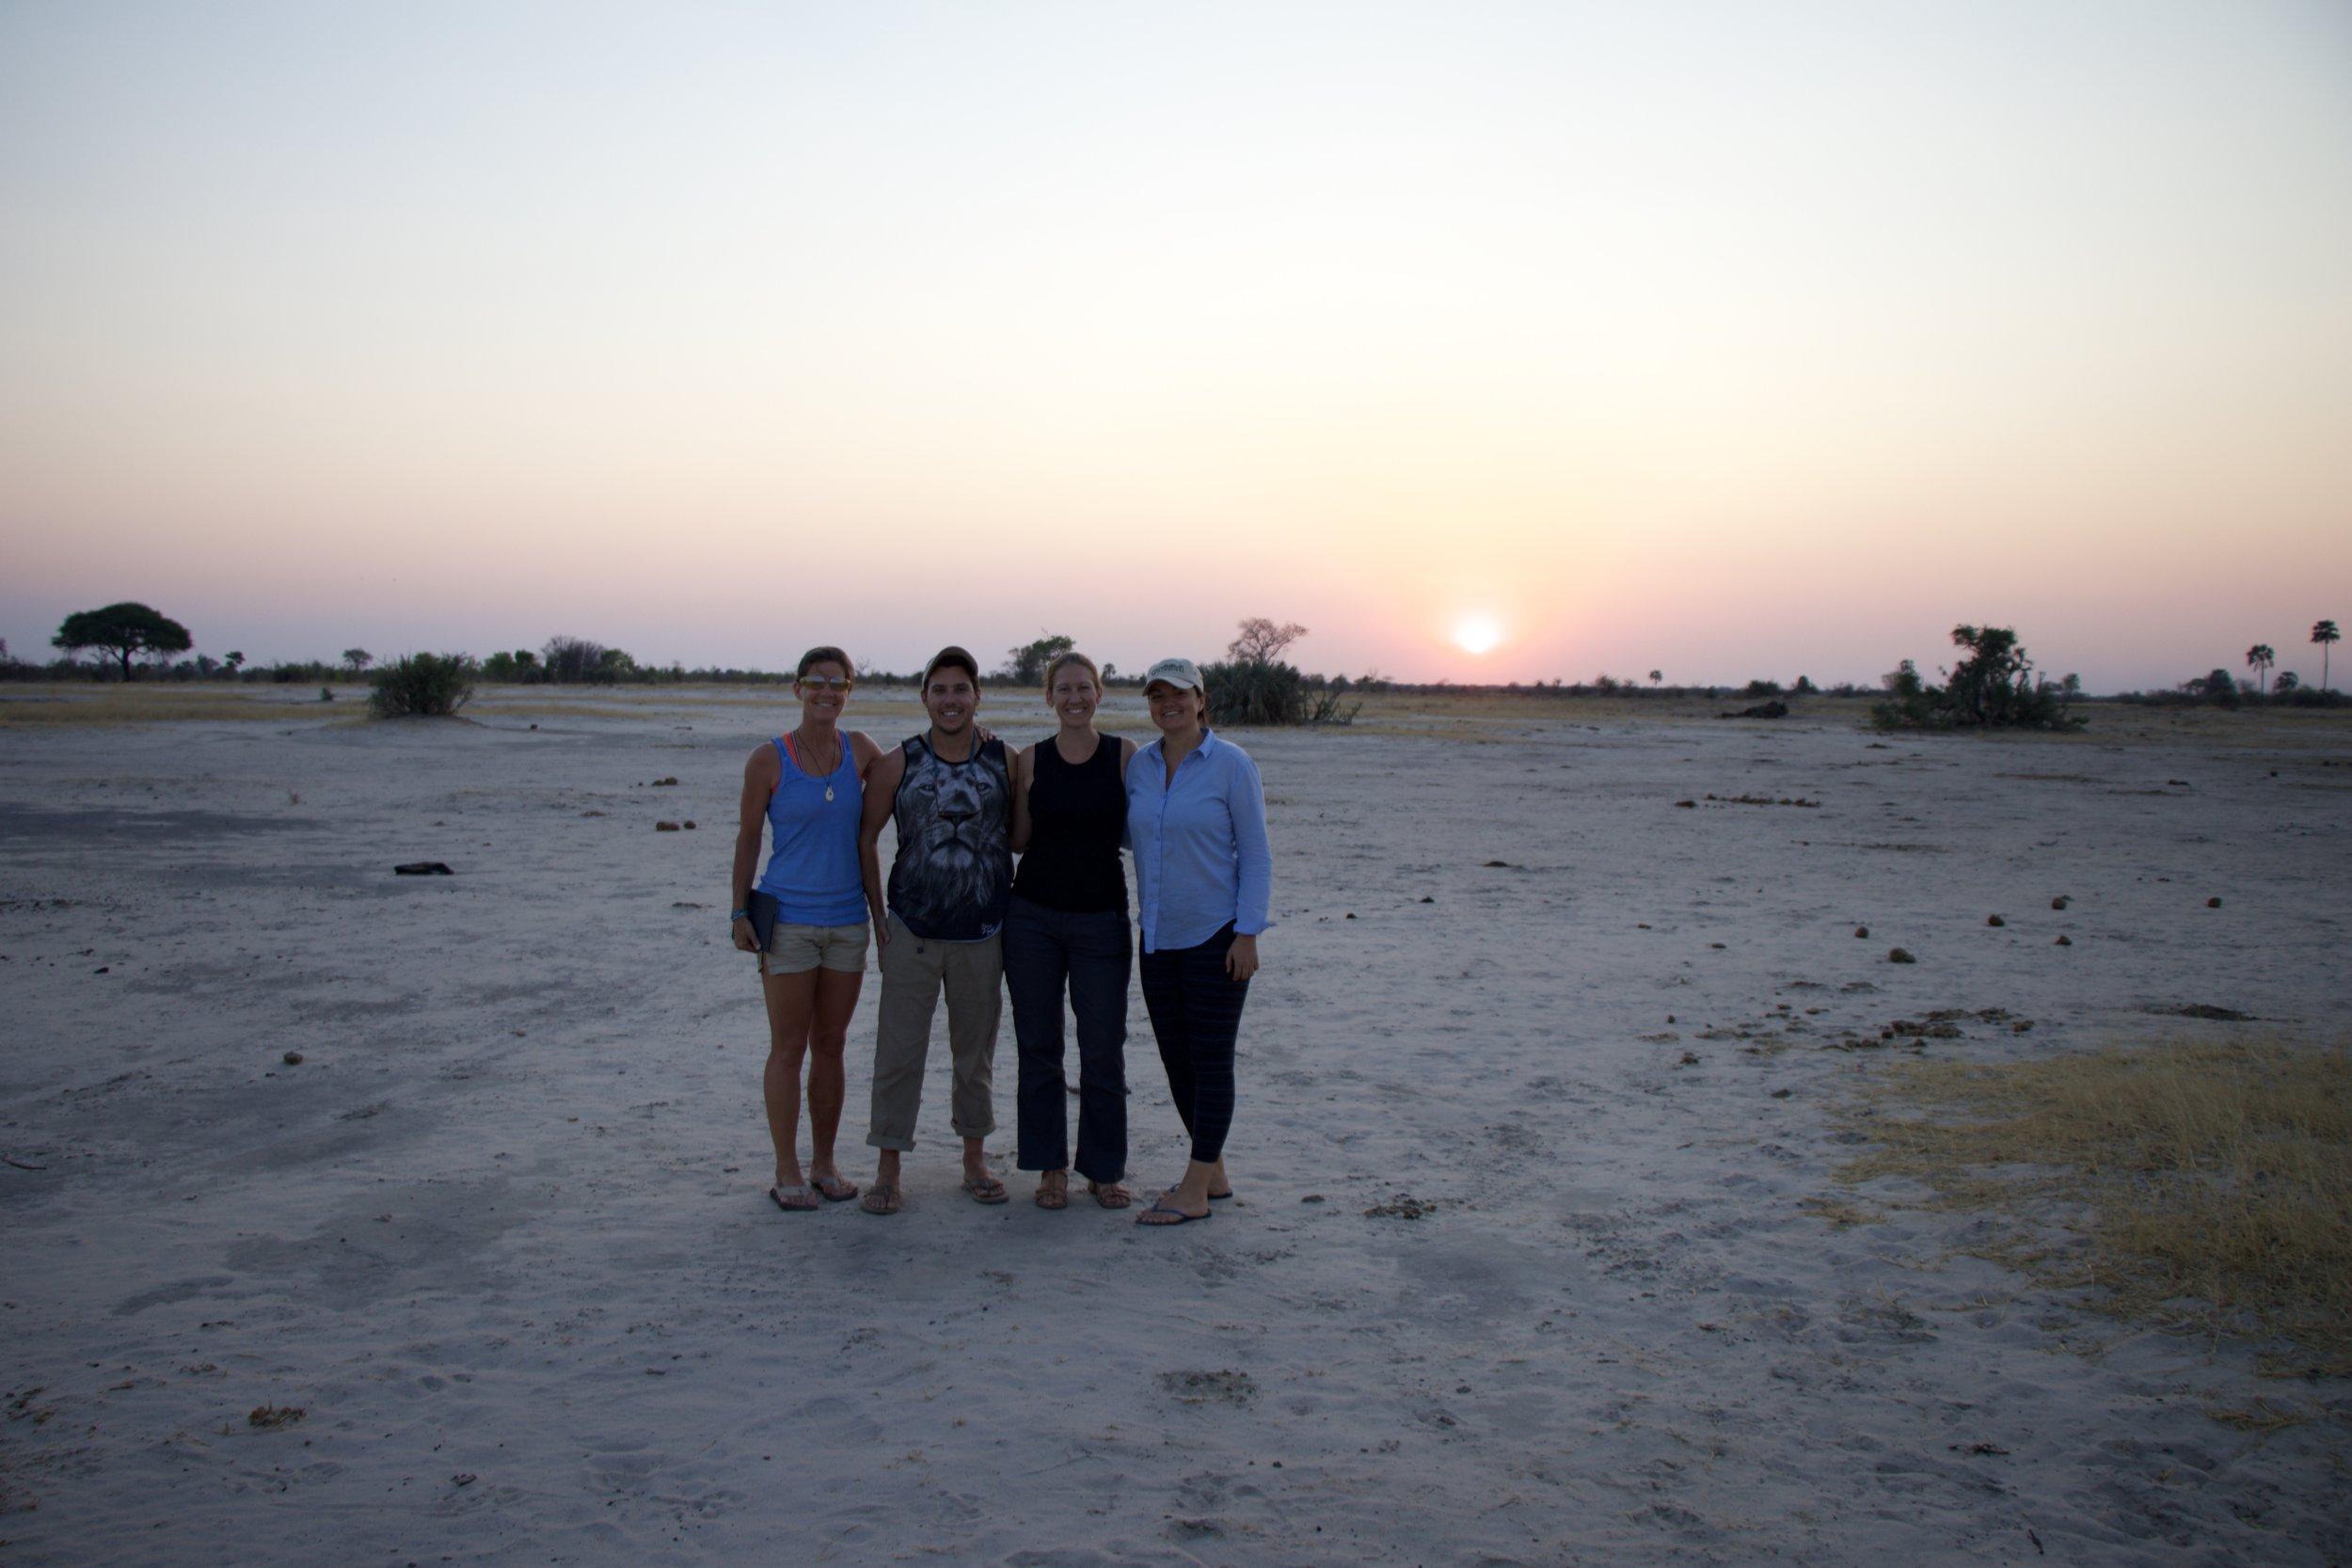 Having sundowners on the border with Botswana and Zimbabwe